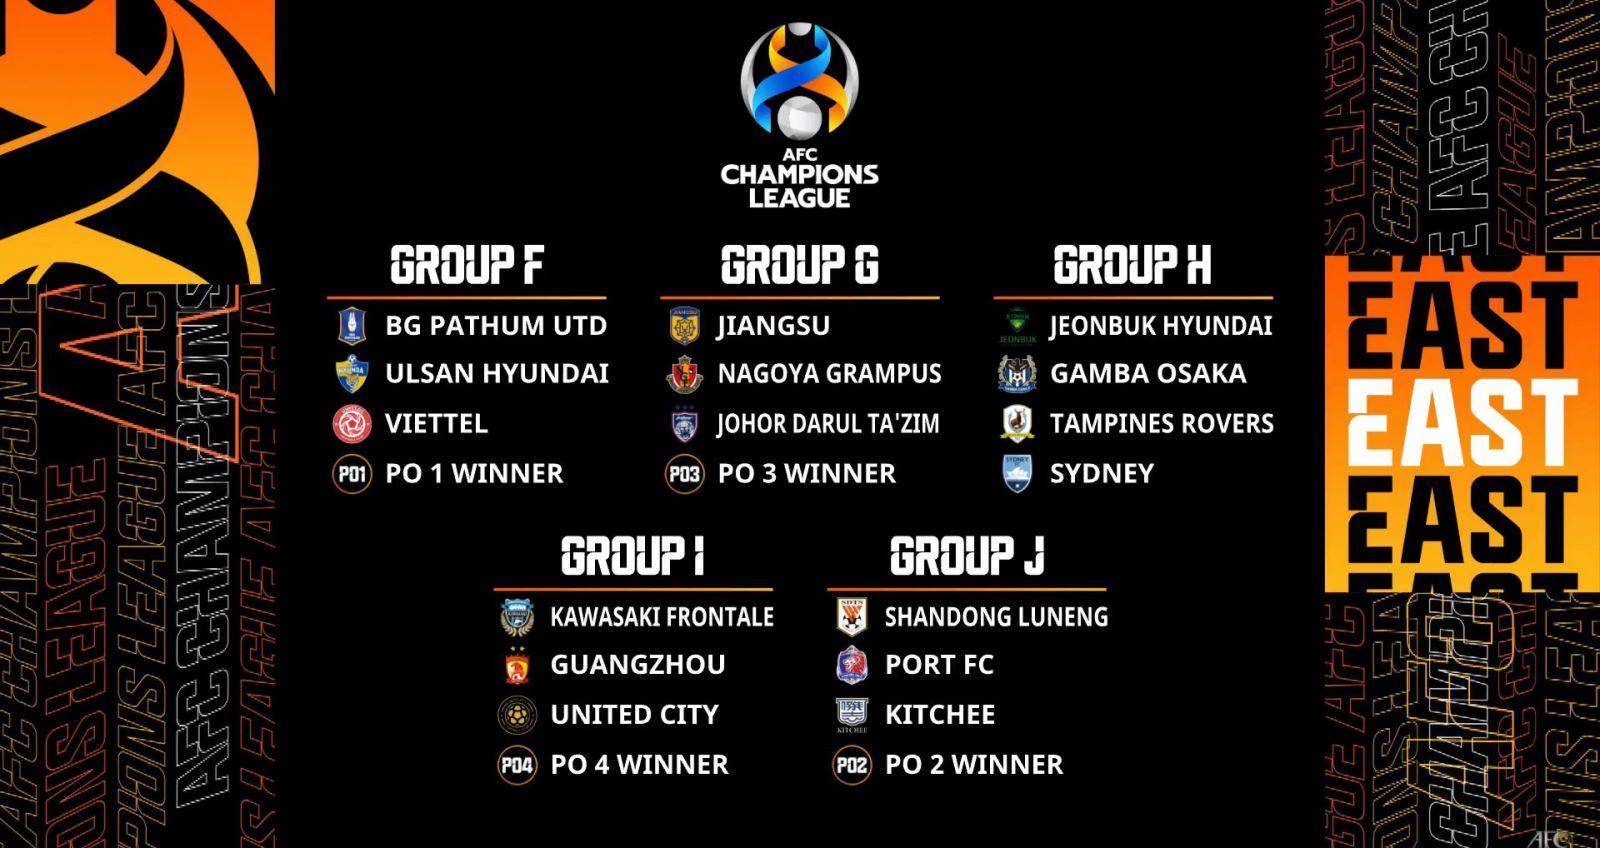 AFC Champions League, Cúp C1 châu Á, Viettel, viettel fc, bốc thăm AFC Champions League